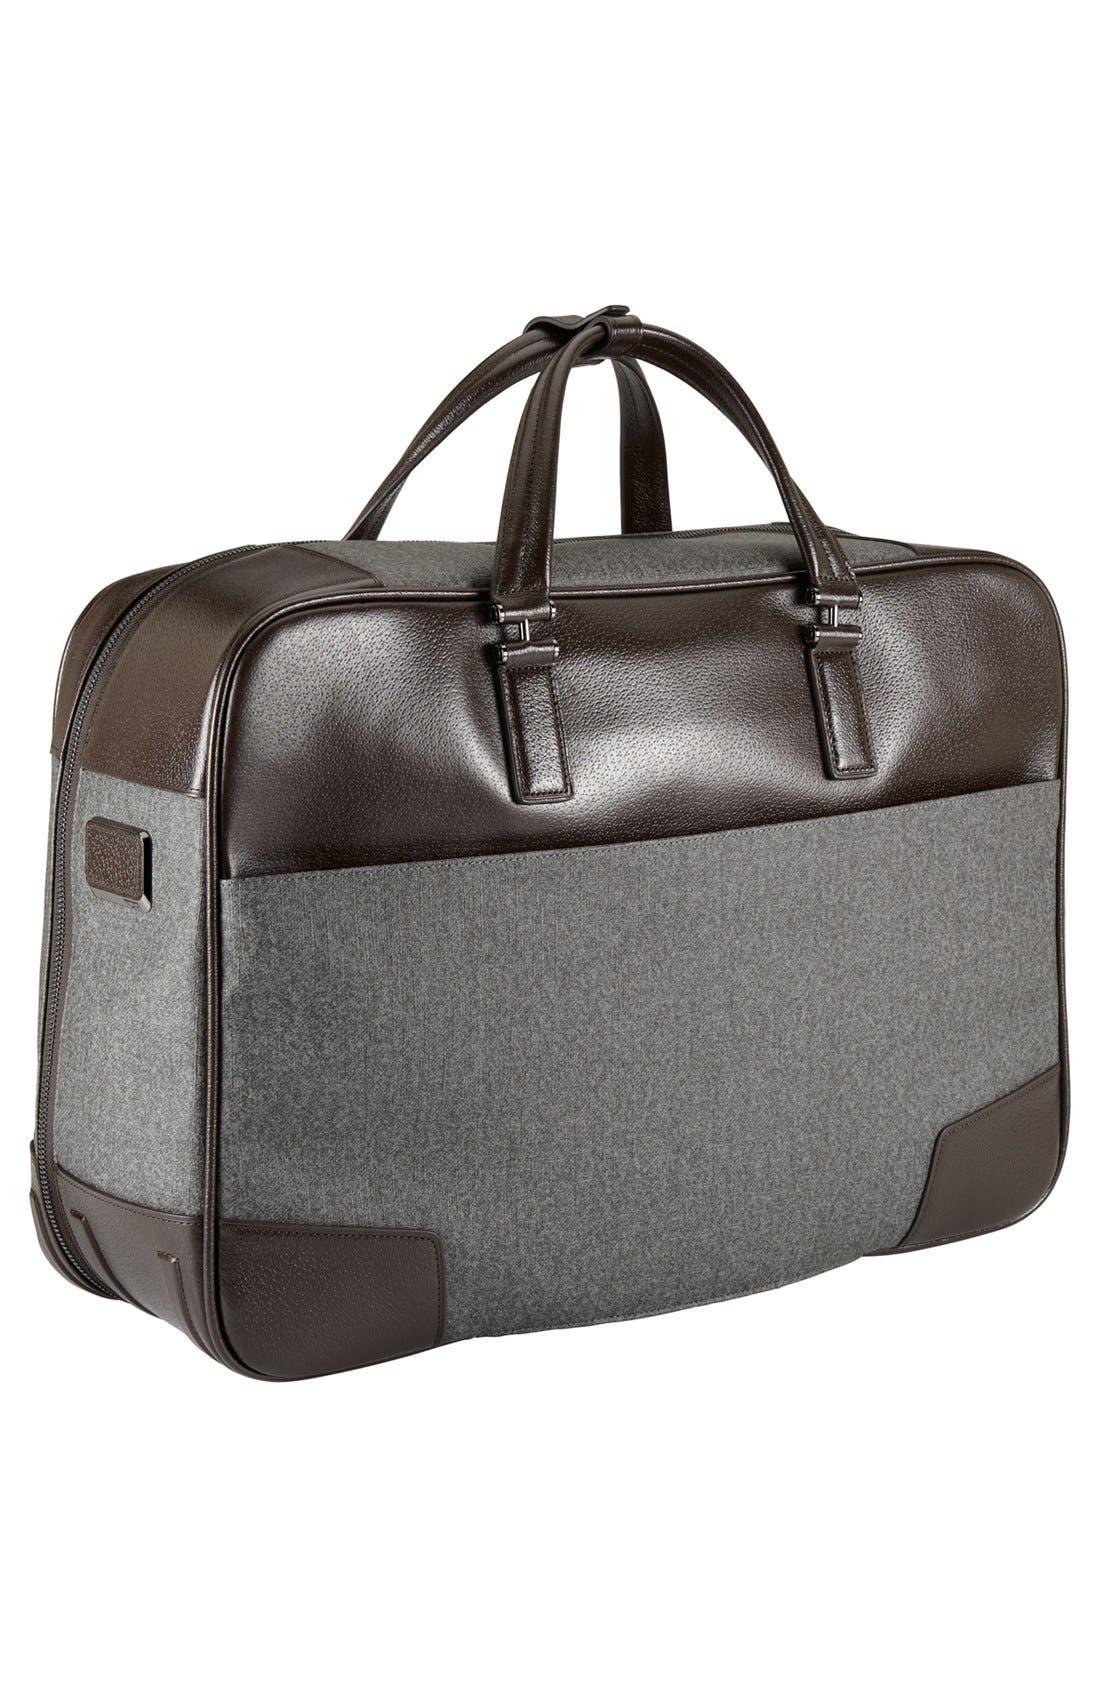 Alternate Image 2  - Tumi 'Astor - Trinity' Softside Carry-On Bag (20 Inch)